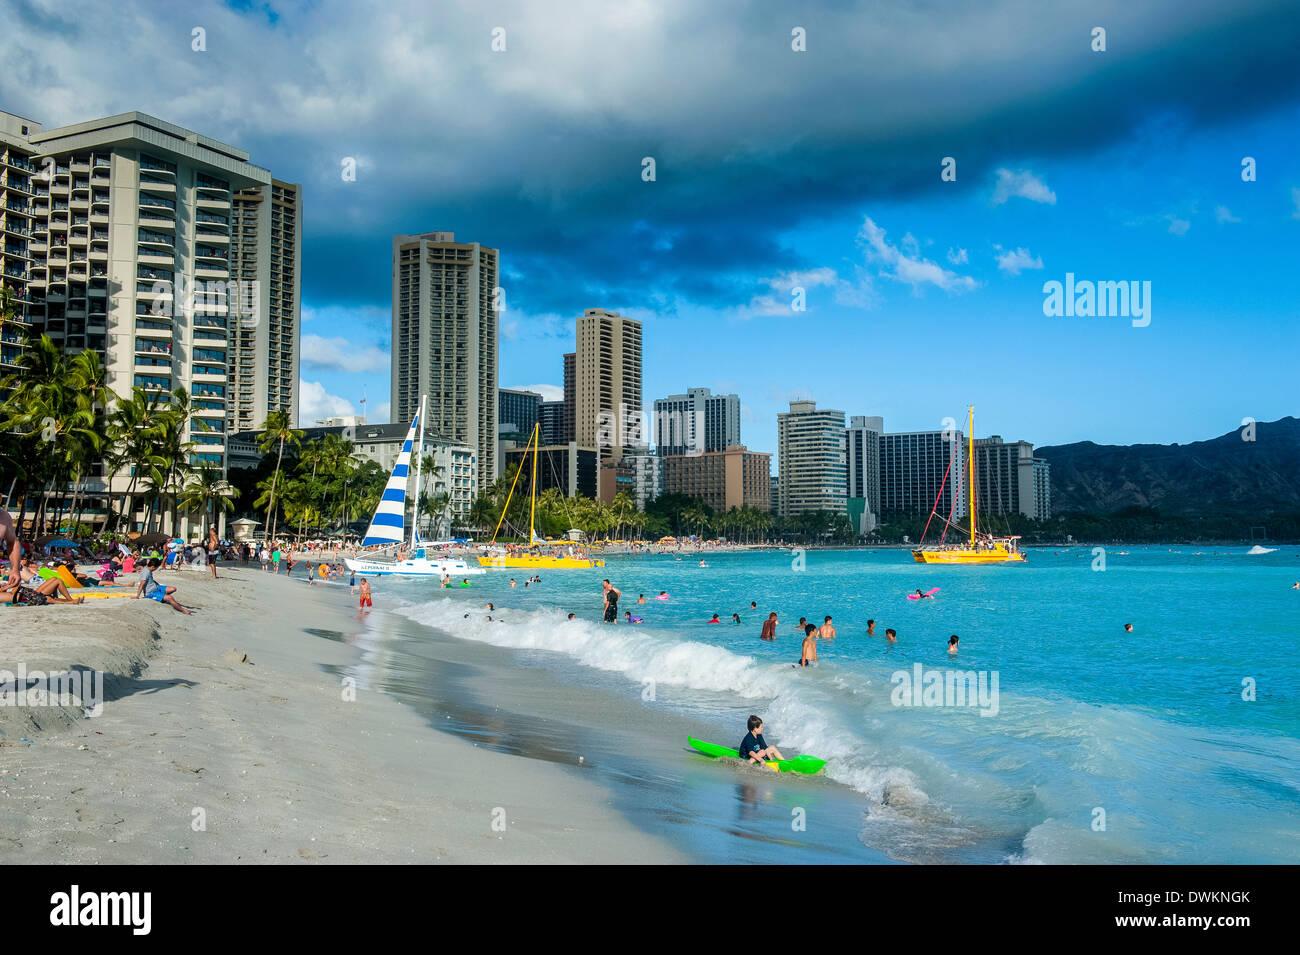 High rise hotels on Waikiki Beach, Oahu, Hawaii, United States of America, Pacific - Stock Image